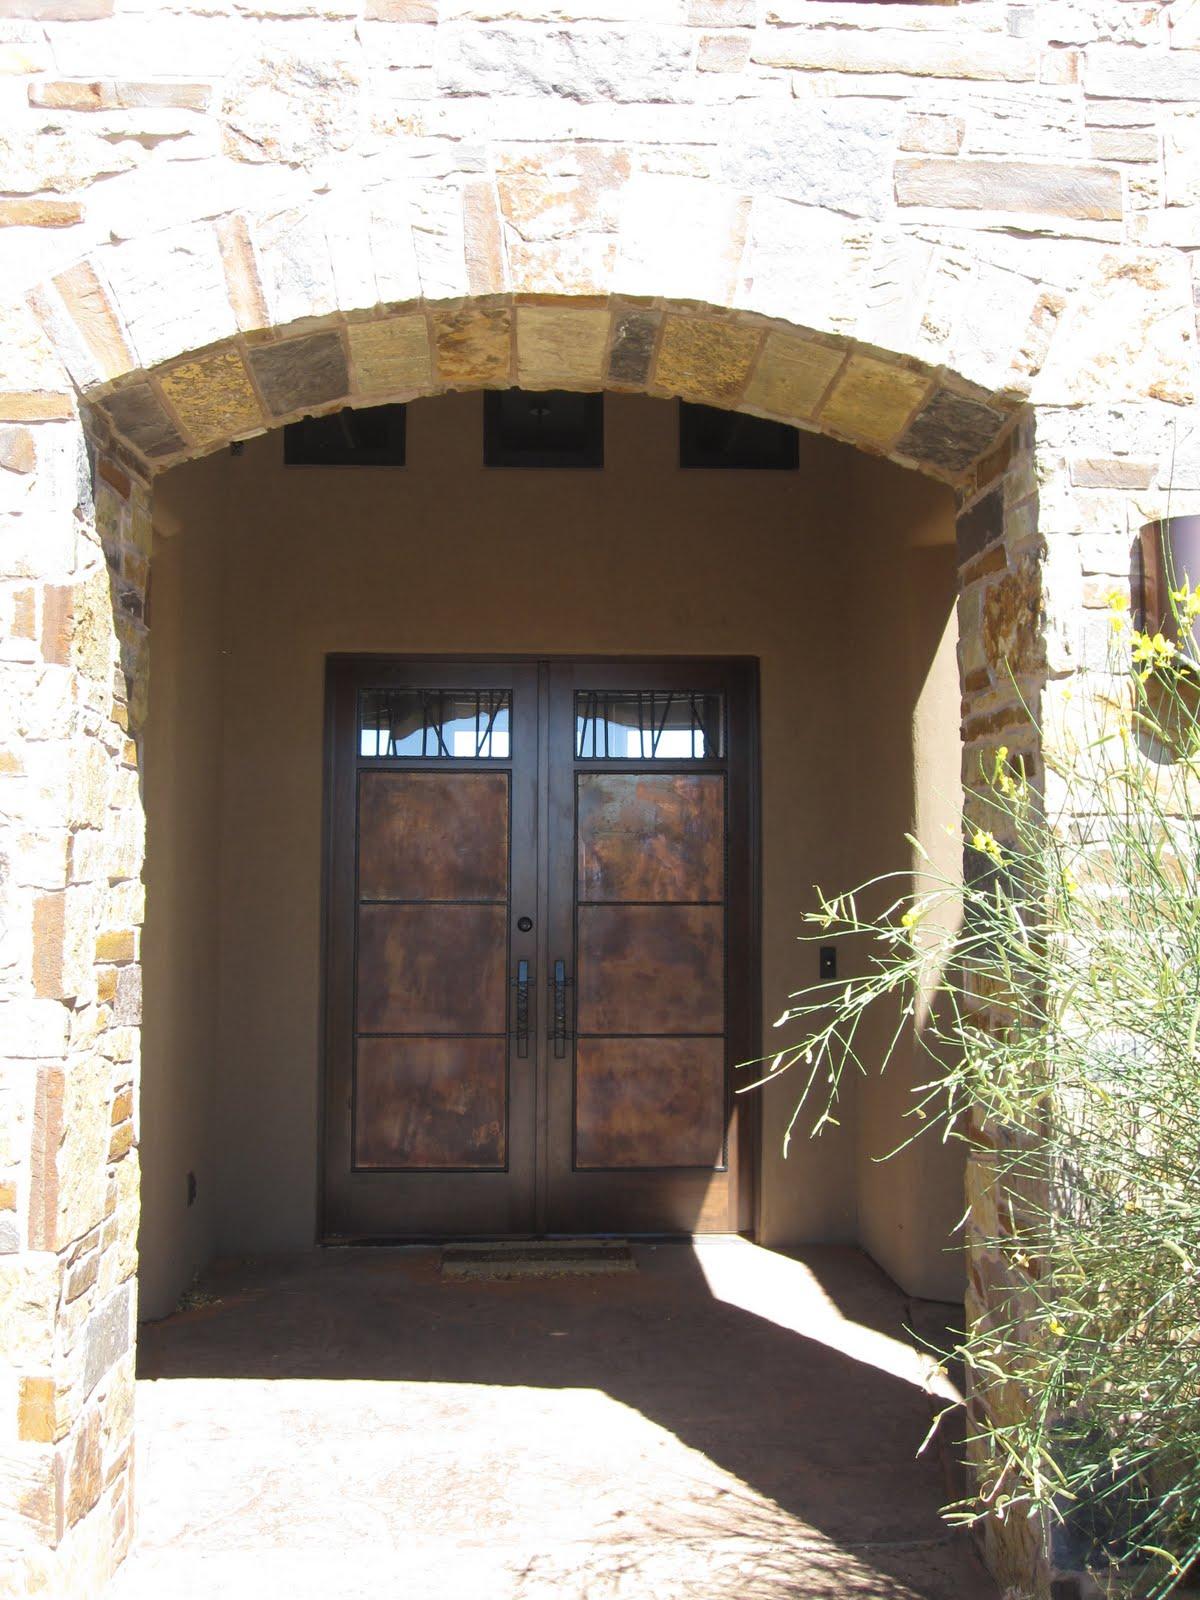 1600 #2C6B9F BIG TIME House Lover : Garage Doors And Gates  St. George Utah wallpaper Utah Garage Doors 36851200